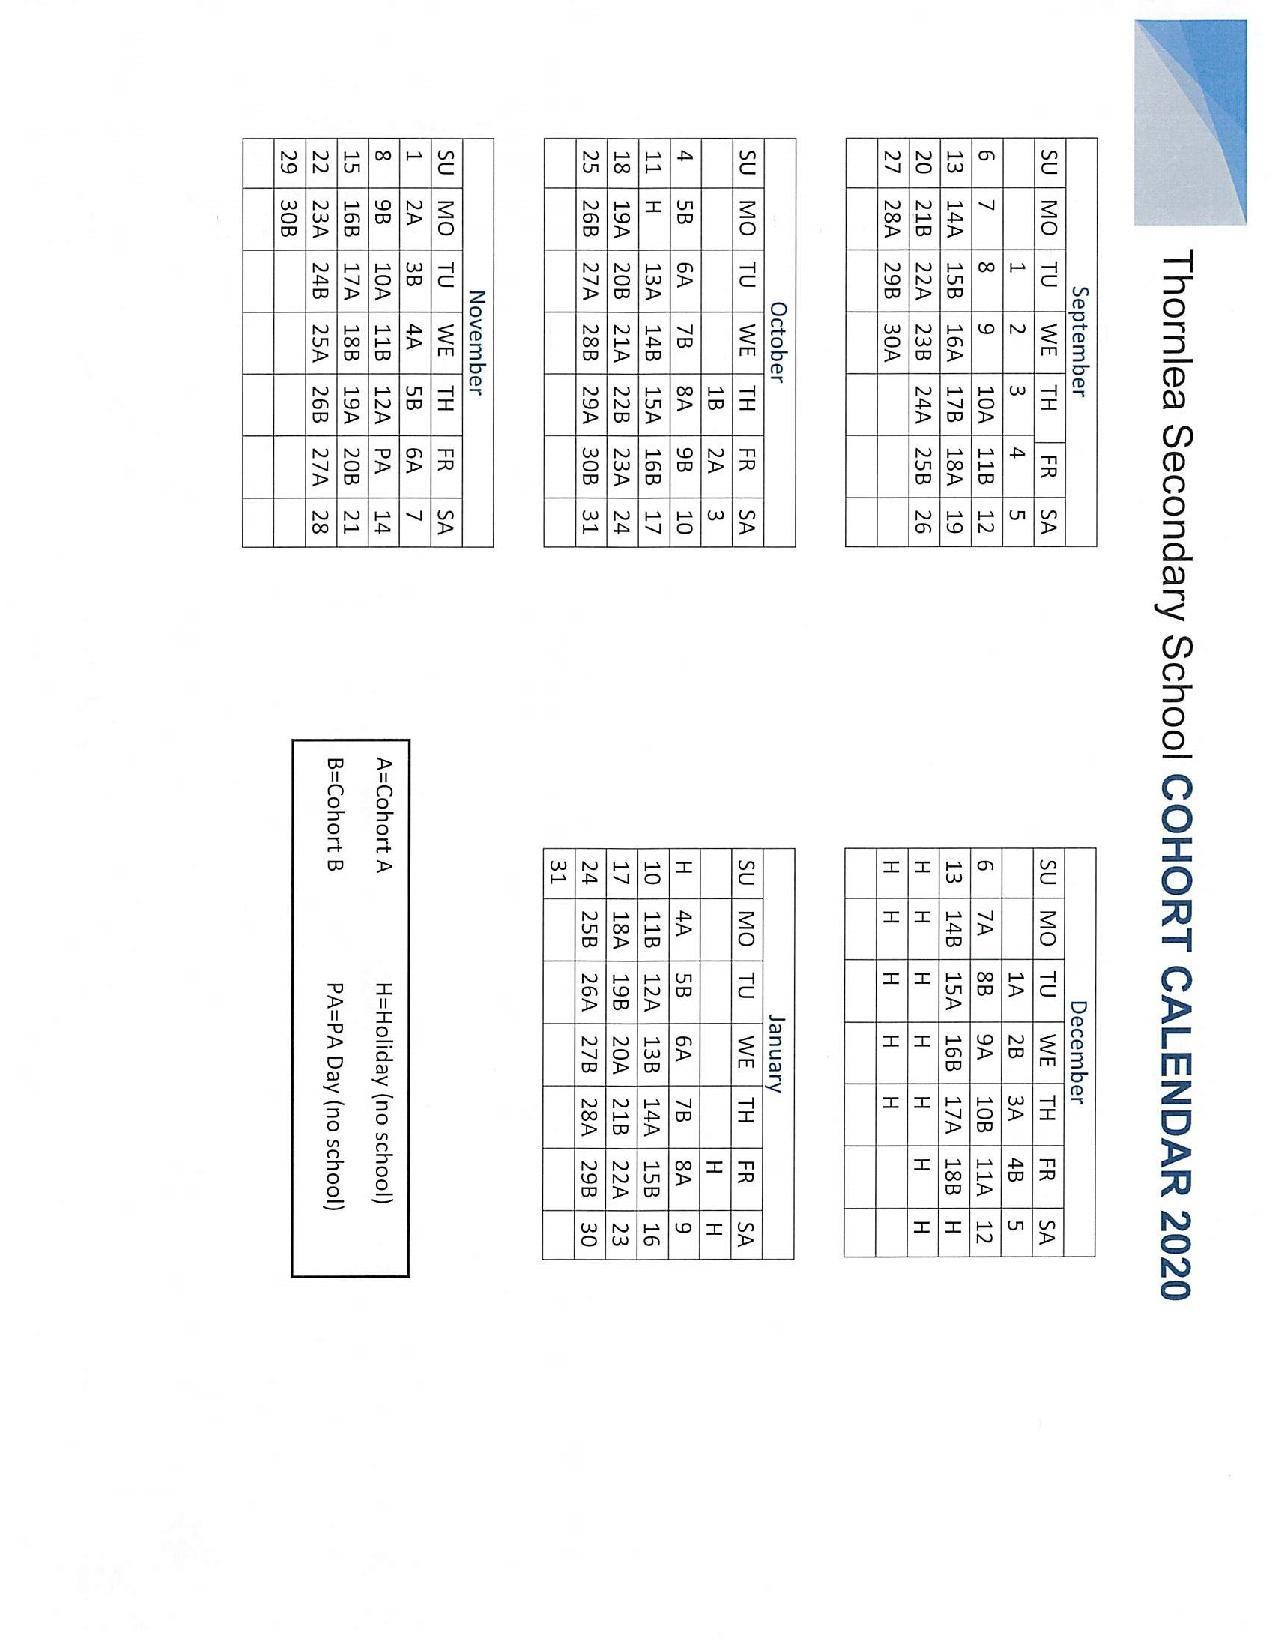 Pages - School Schedule, Rotation Schedule, And Cohort Calendar regarding Yrdsb School Calender